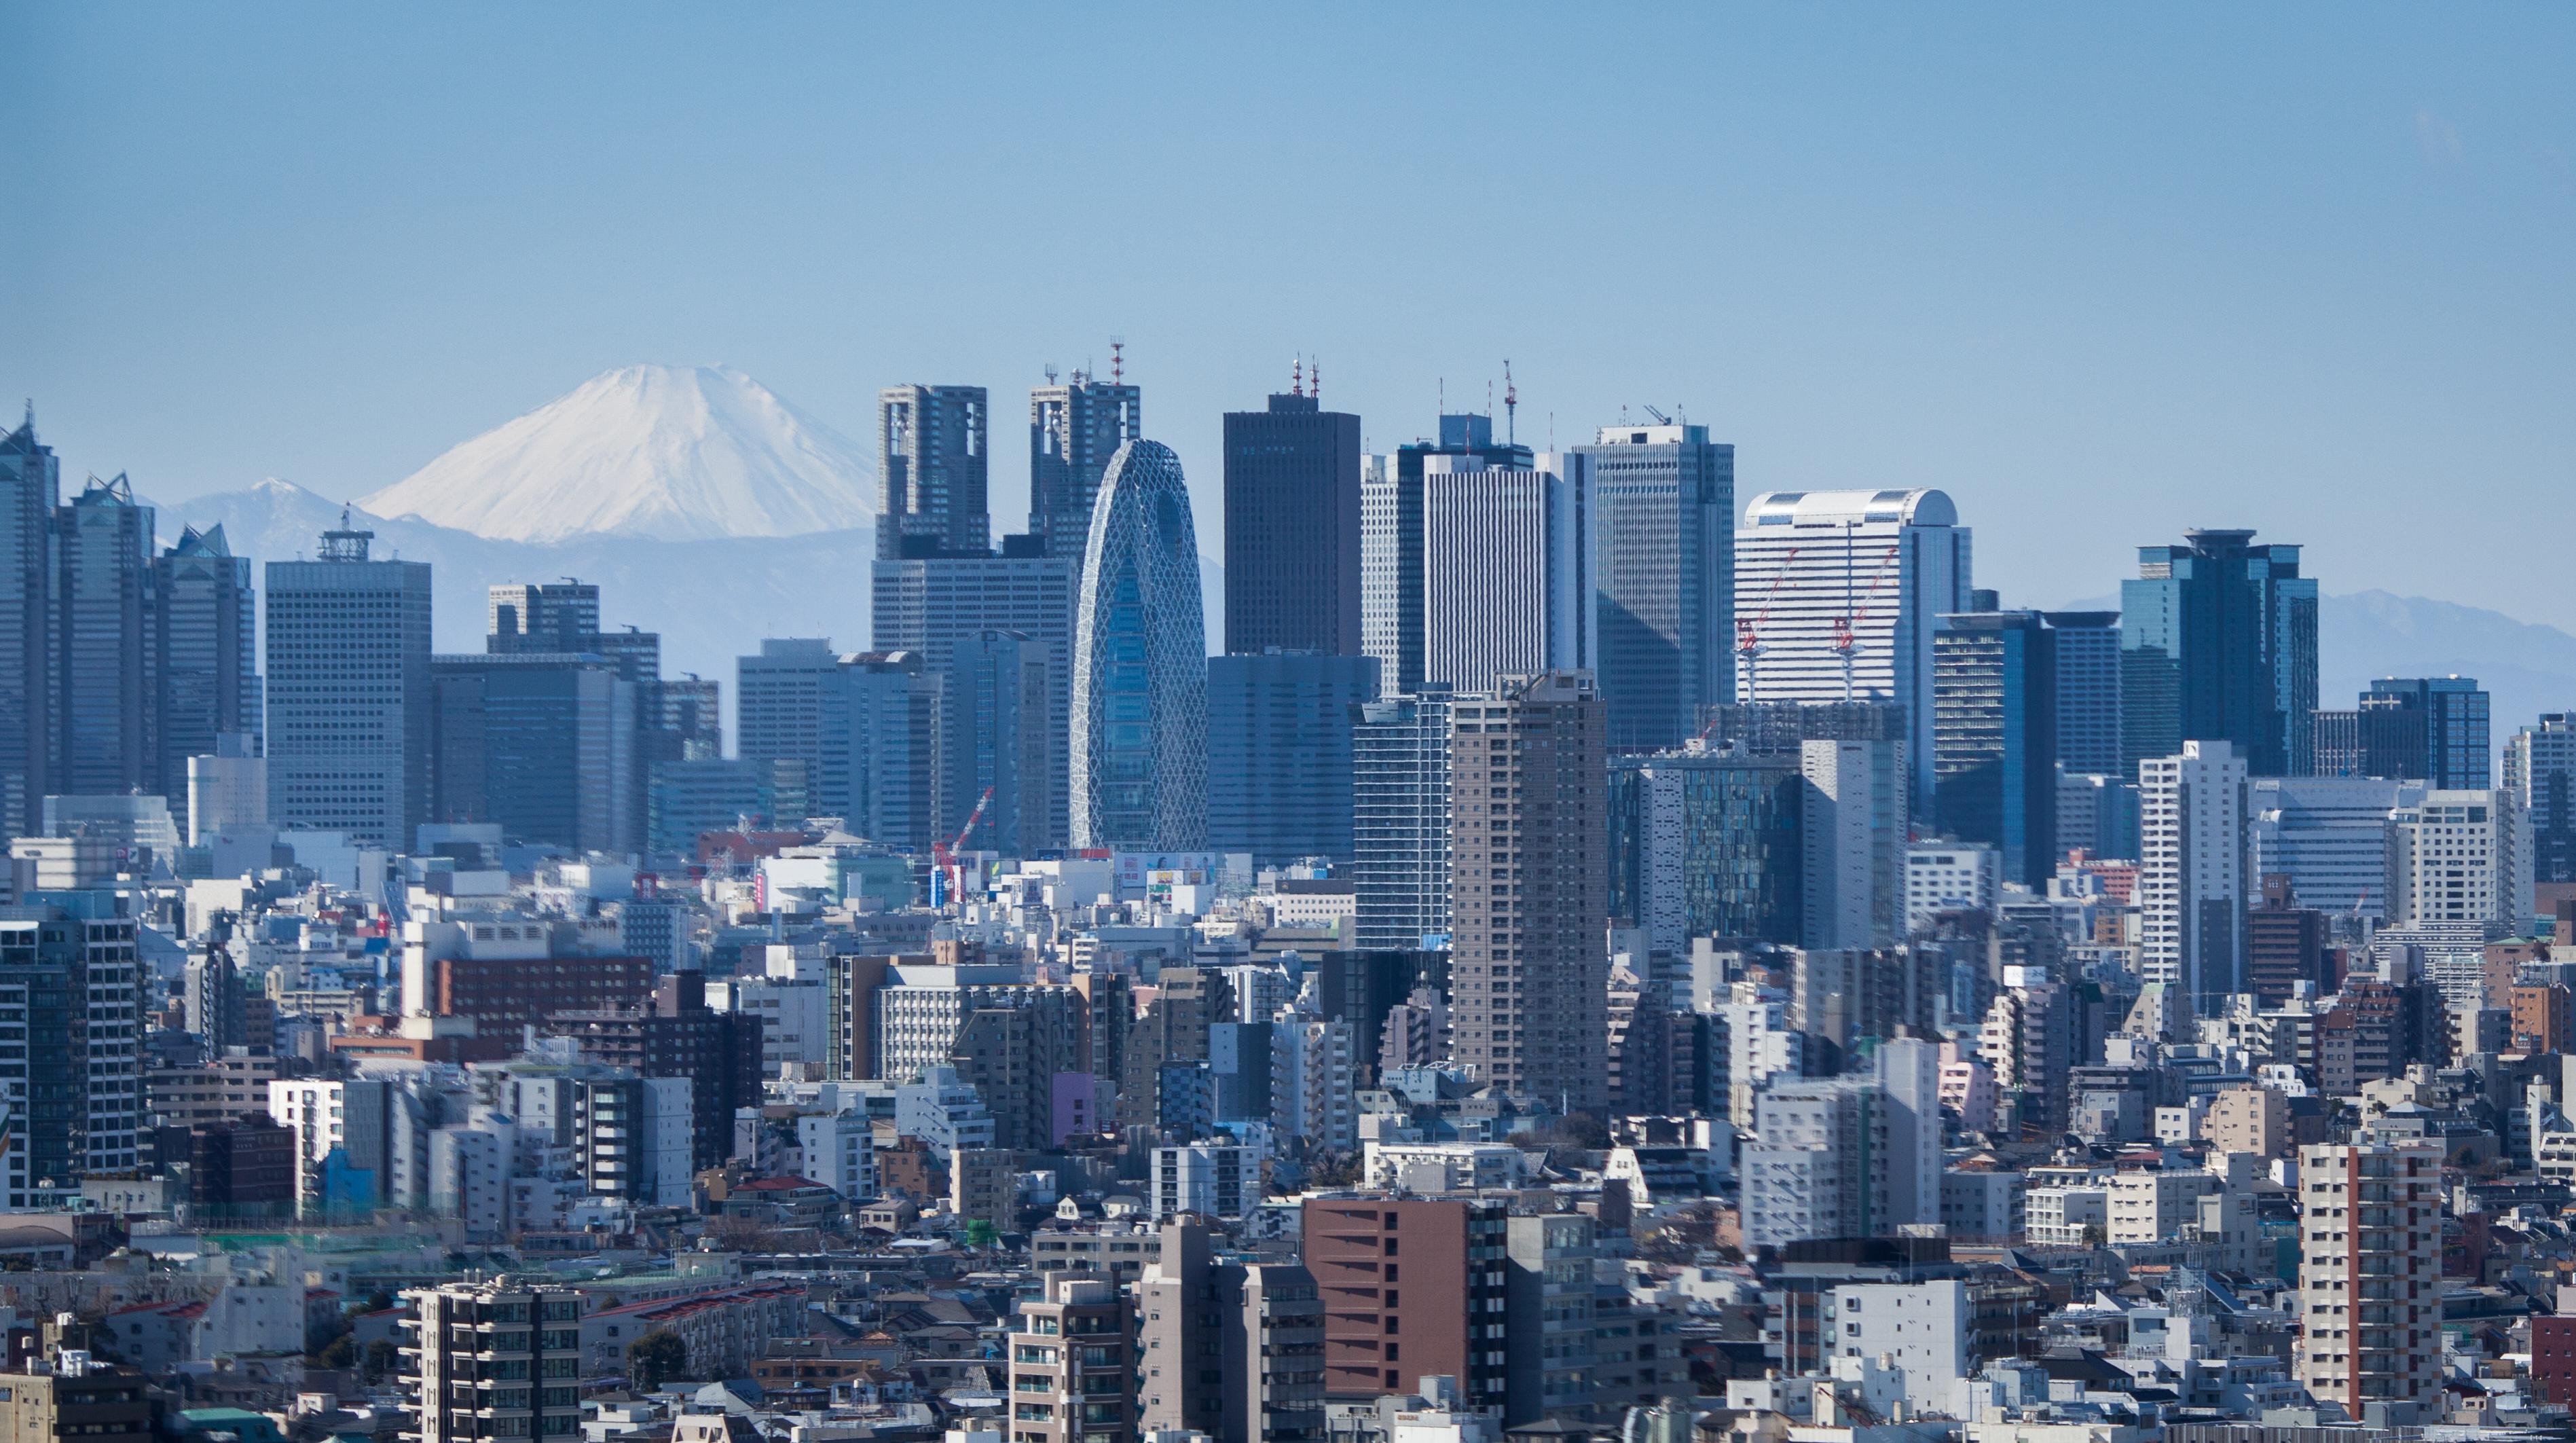 Tokyo skyline infront of Mt. Fuji